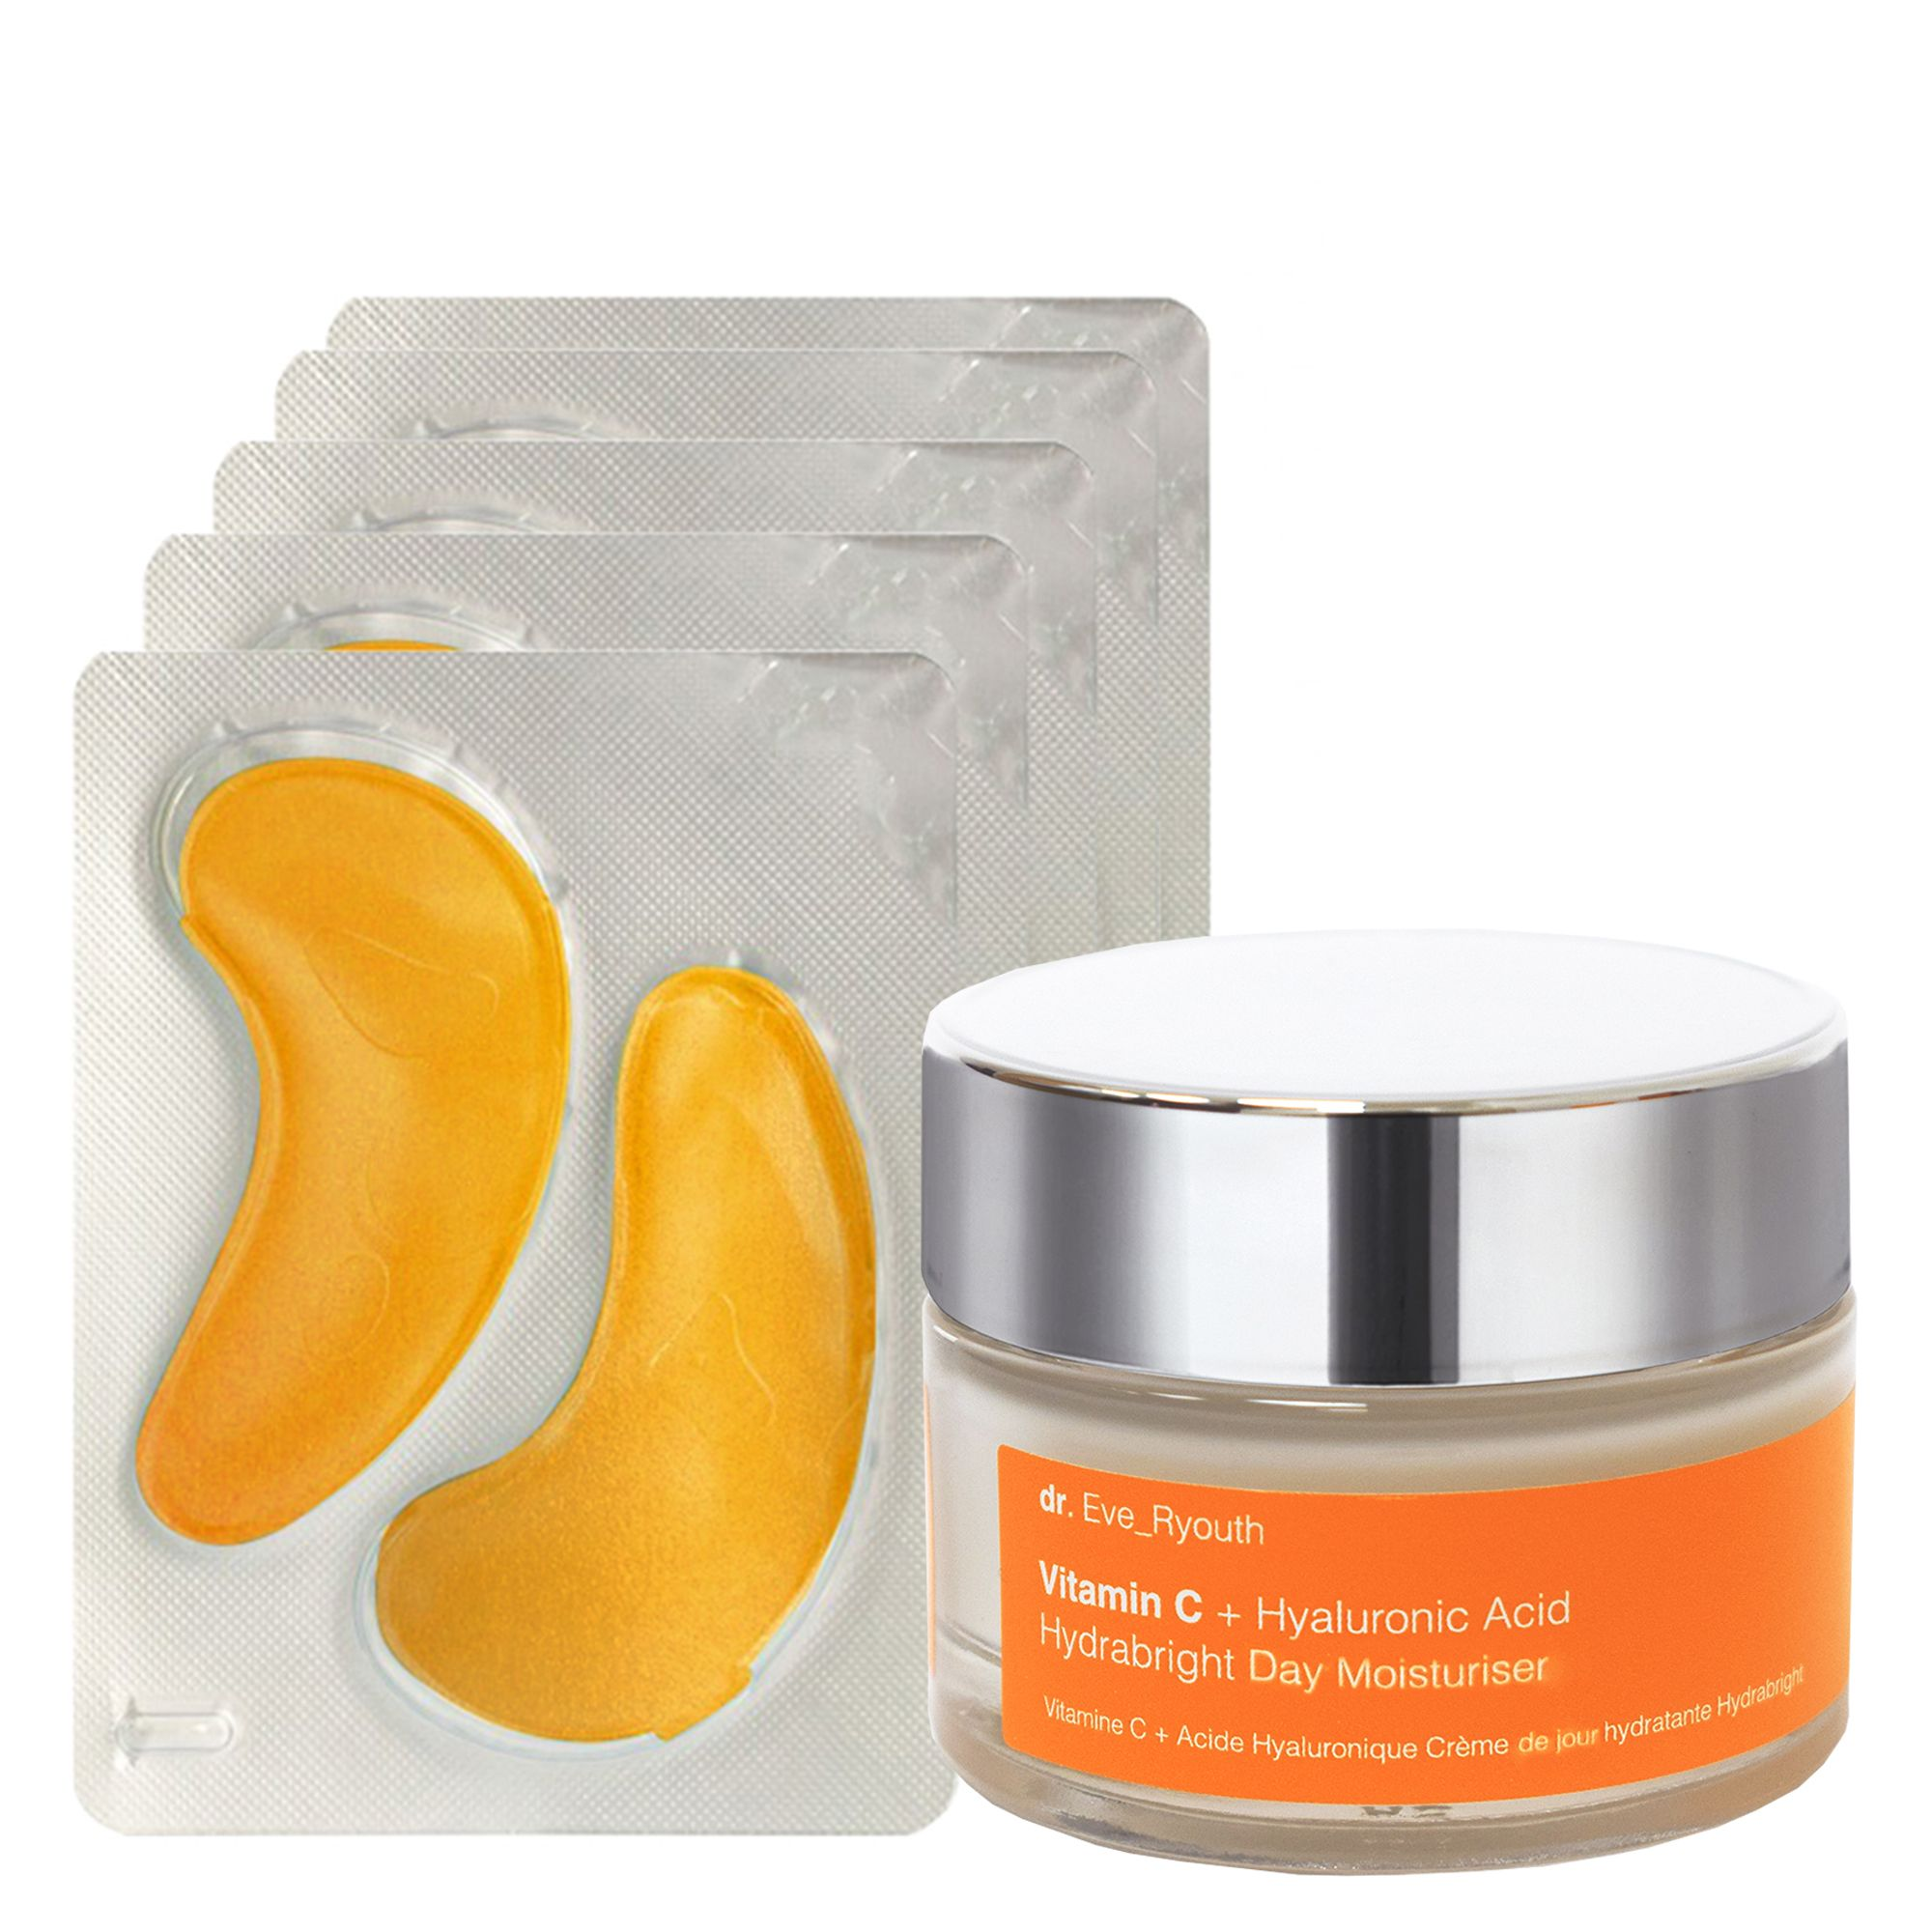 24K Gold + Antioxidant Hydrating Eye Treatments Pads + Vitamin C + Hyaluronic AcidHydrabrightDay Moisturiser 50ml